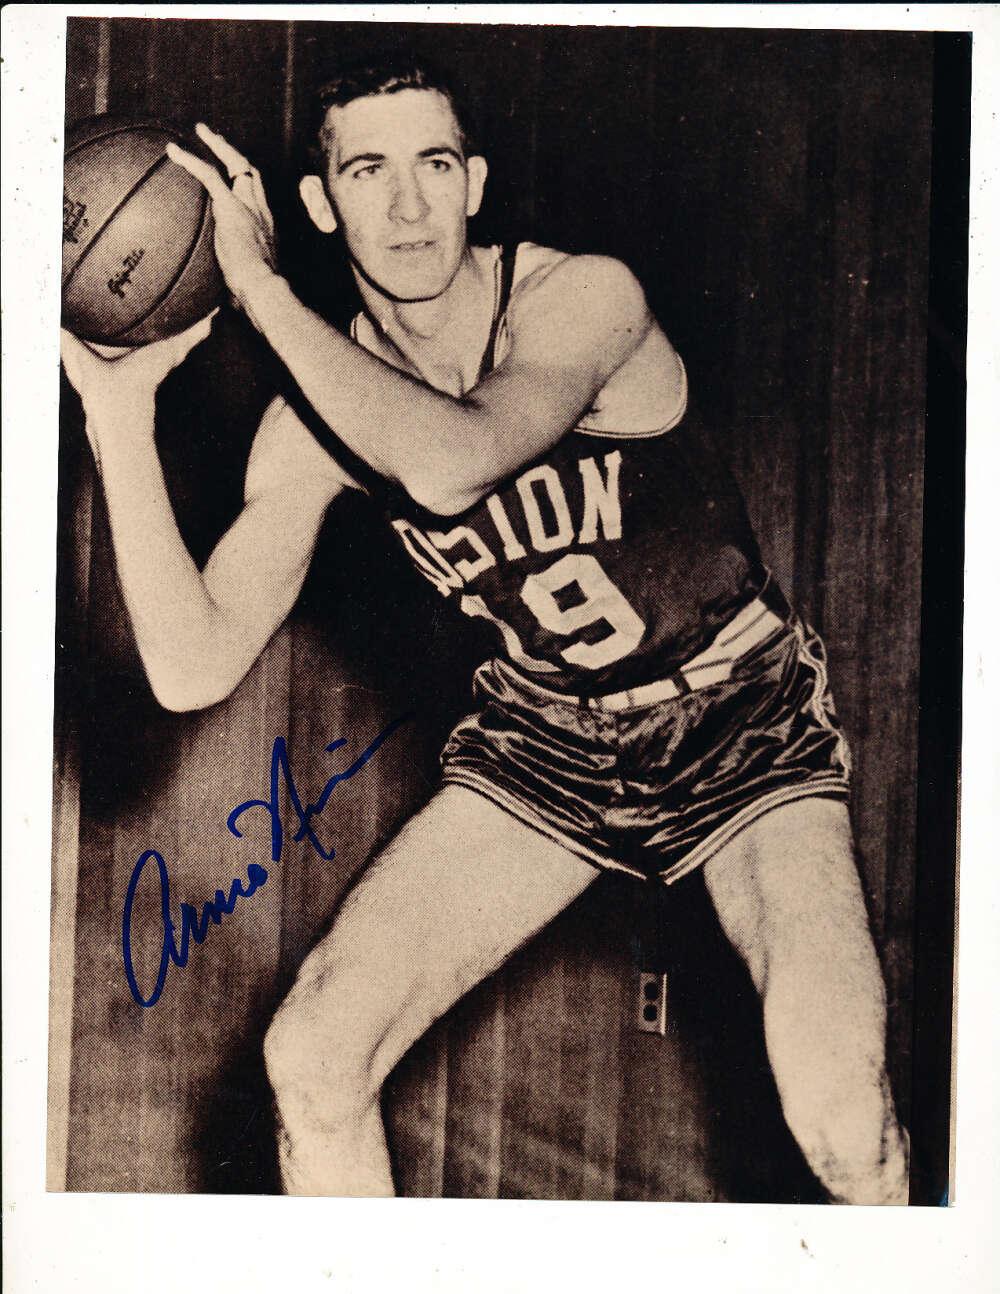 Arnie Risen Boston Celtics signed 8x10 photo